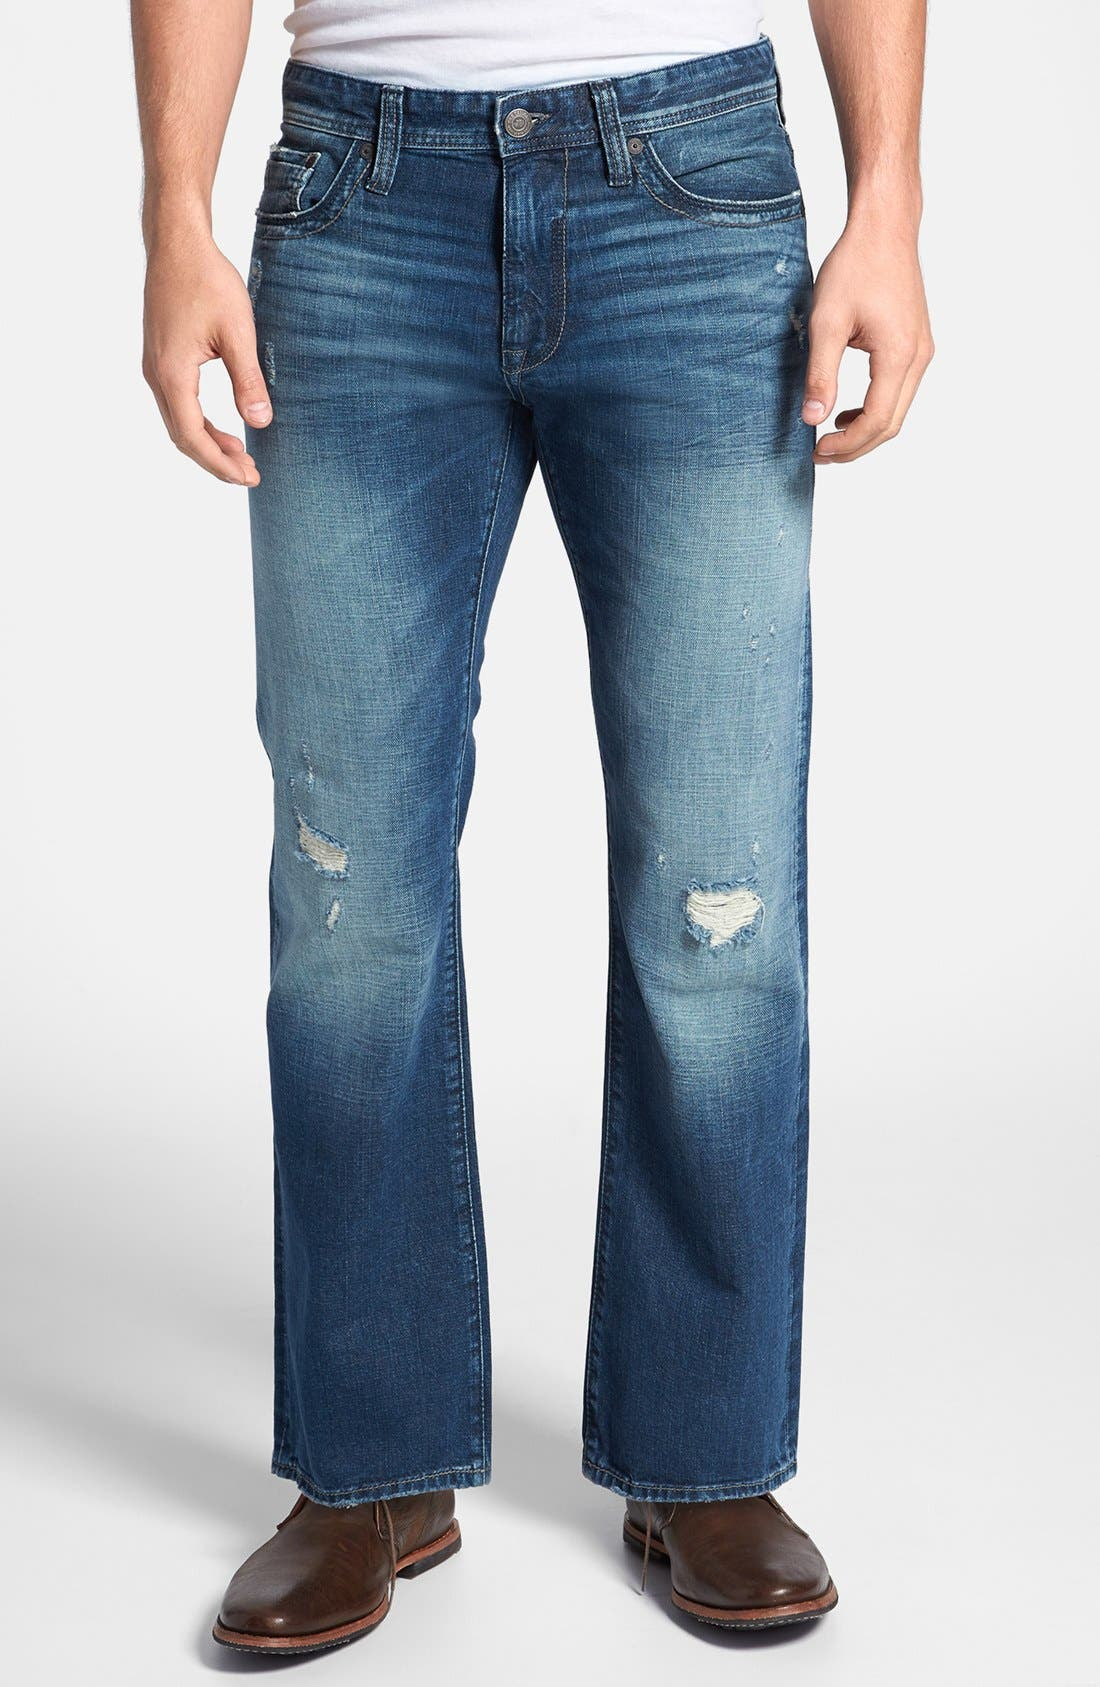 Alternate Image 1 Selected - Mavi Jeans 'Josh' Bootcut Jeans (Indigo Cashmere)